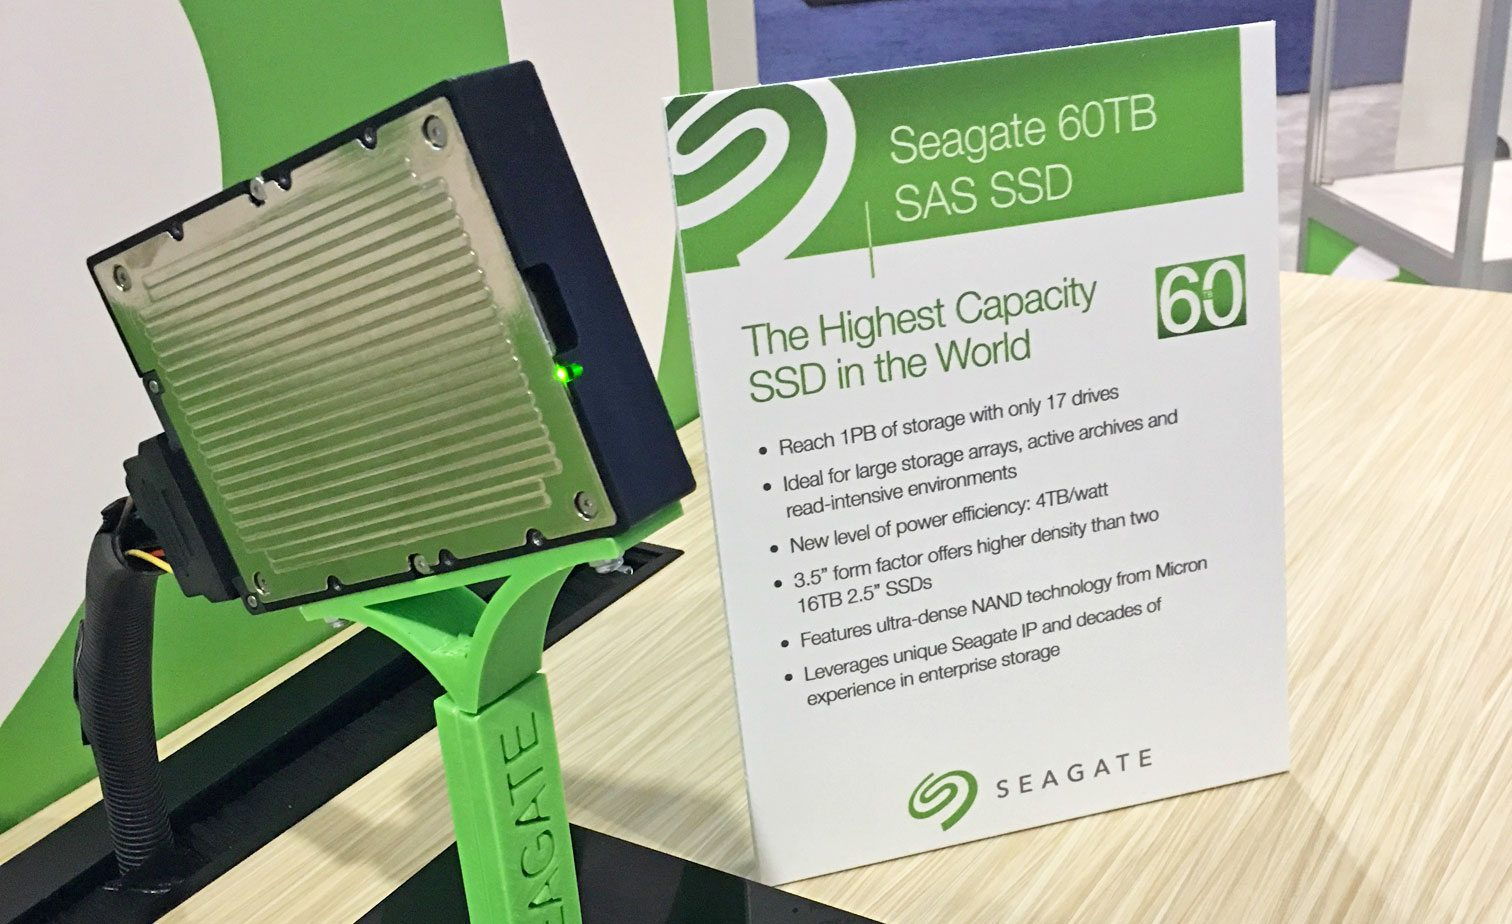 Seagate сделала SSD емкостью 60 Тбайт